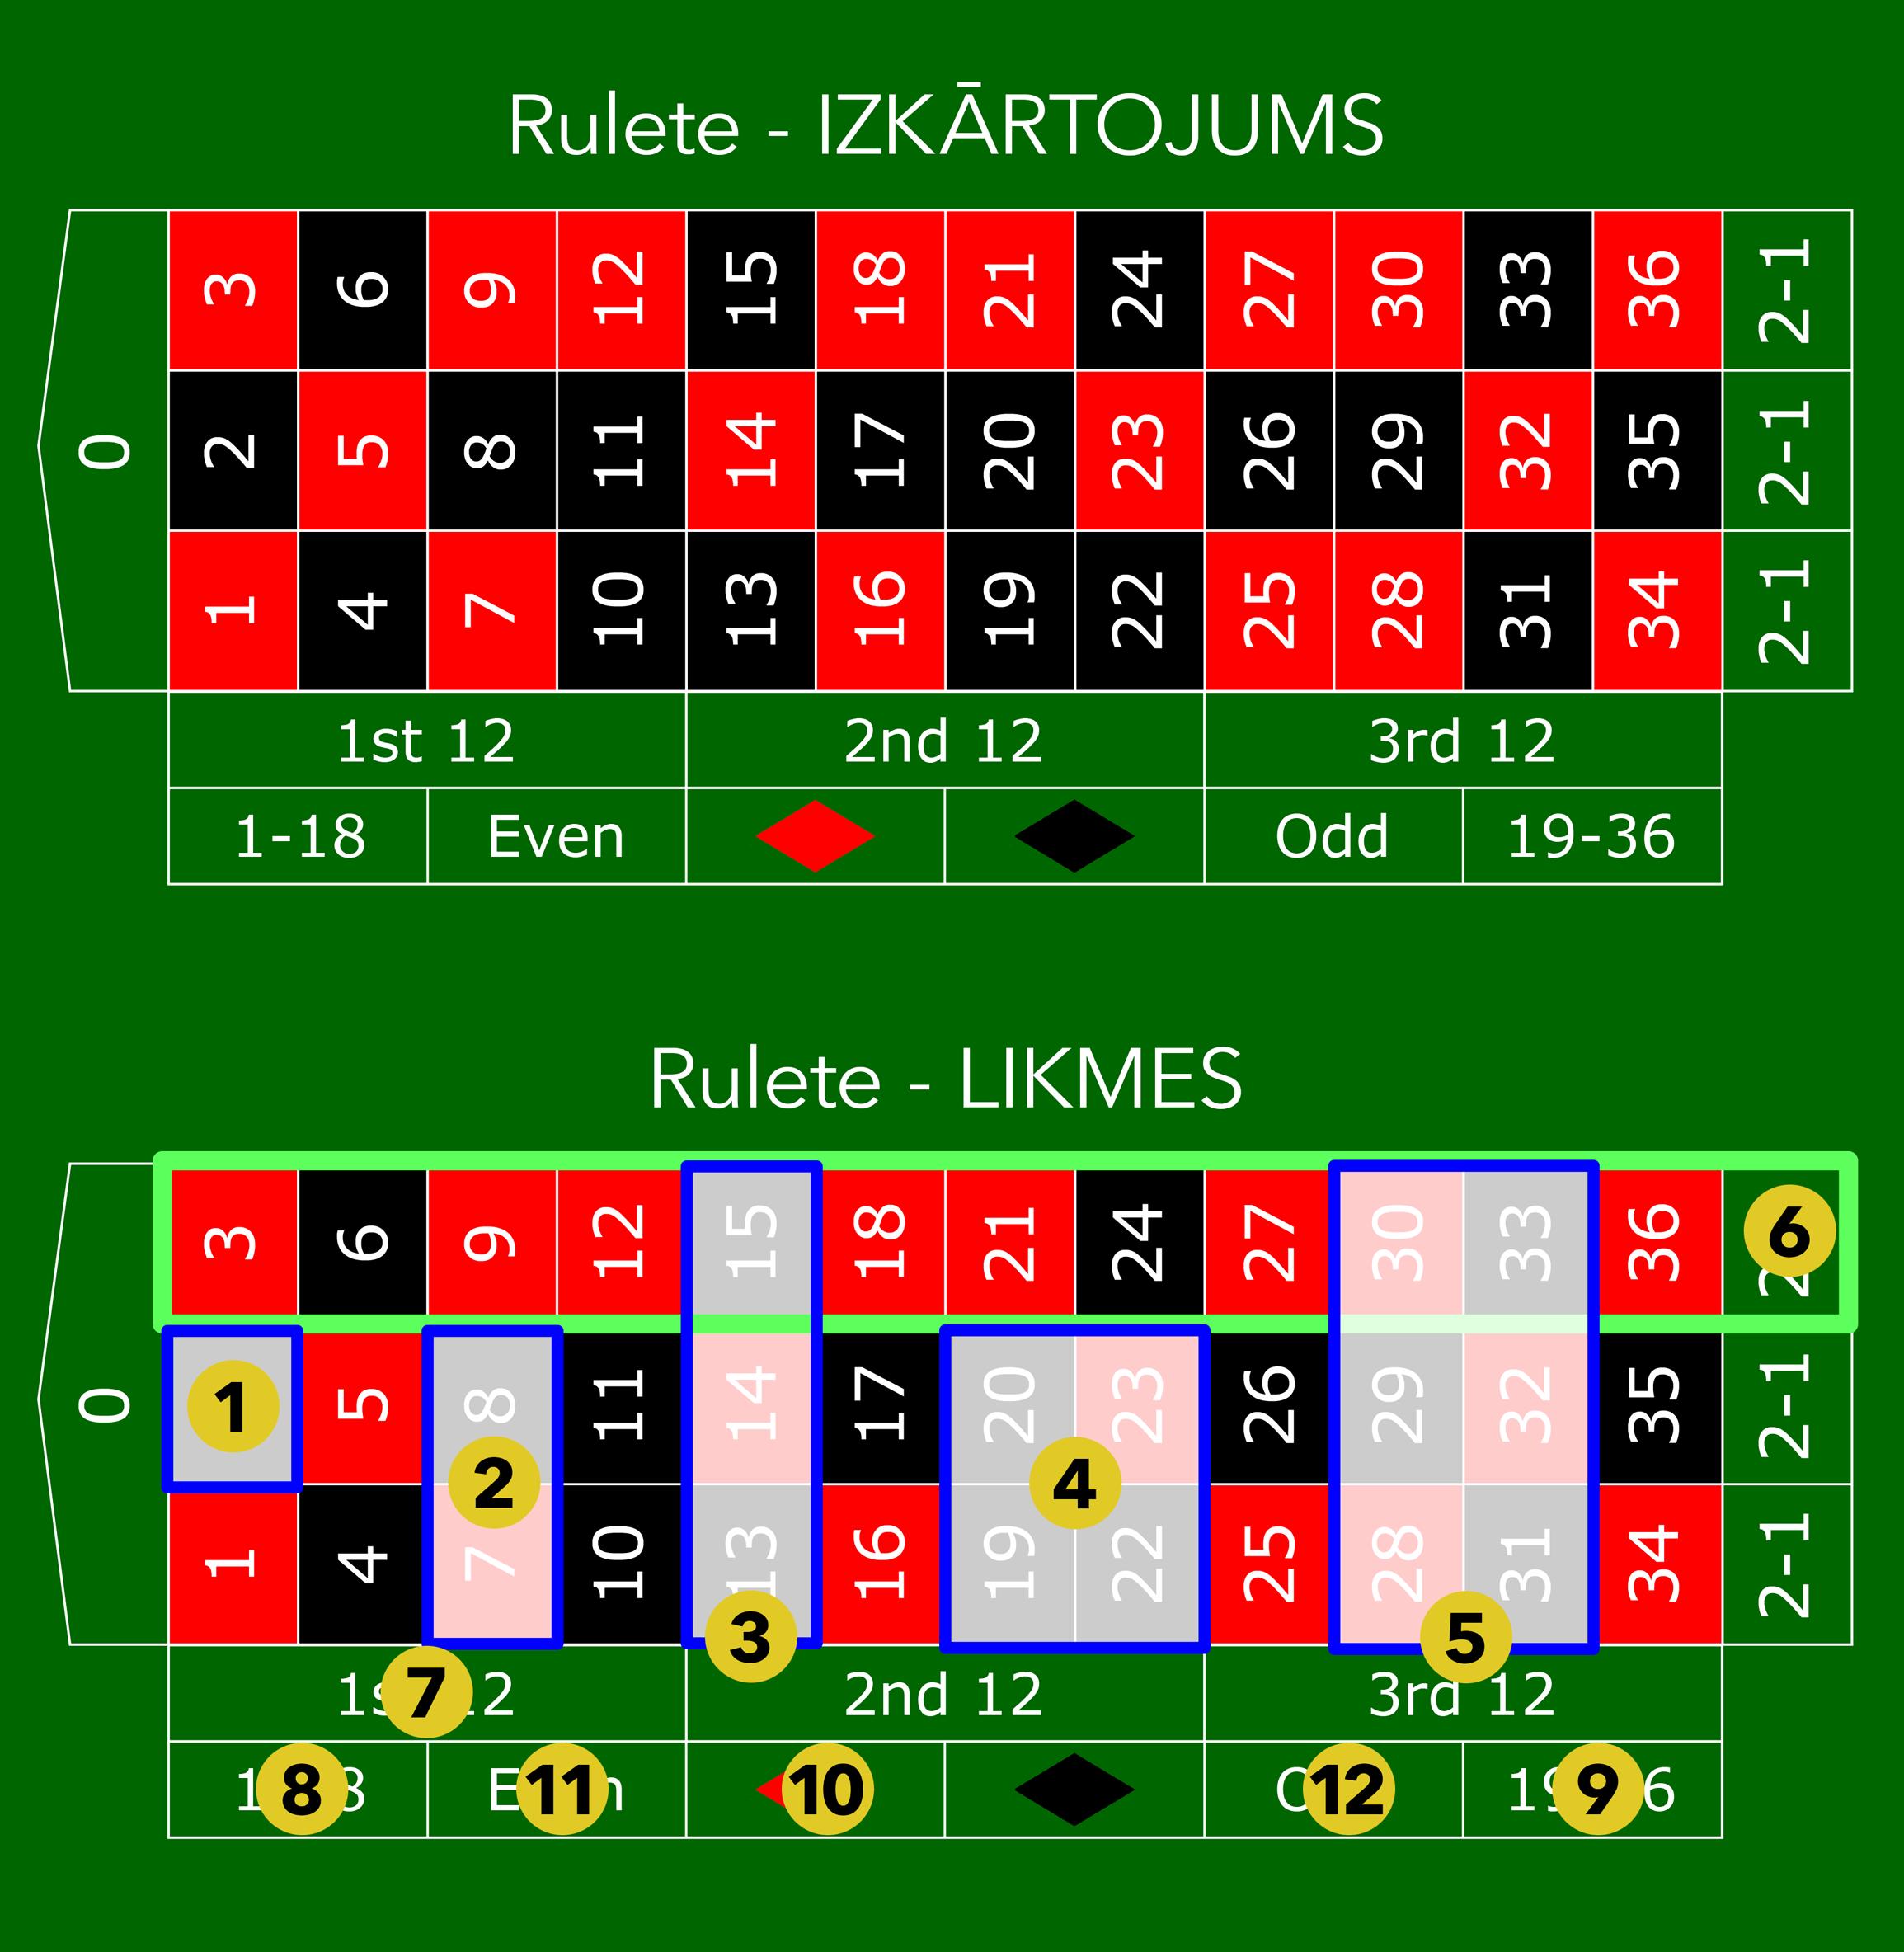 Ruletes noteikumi_Ruletes-izkārtojums-un-likmes